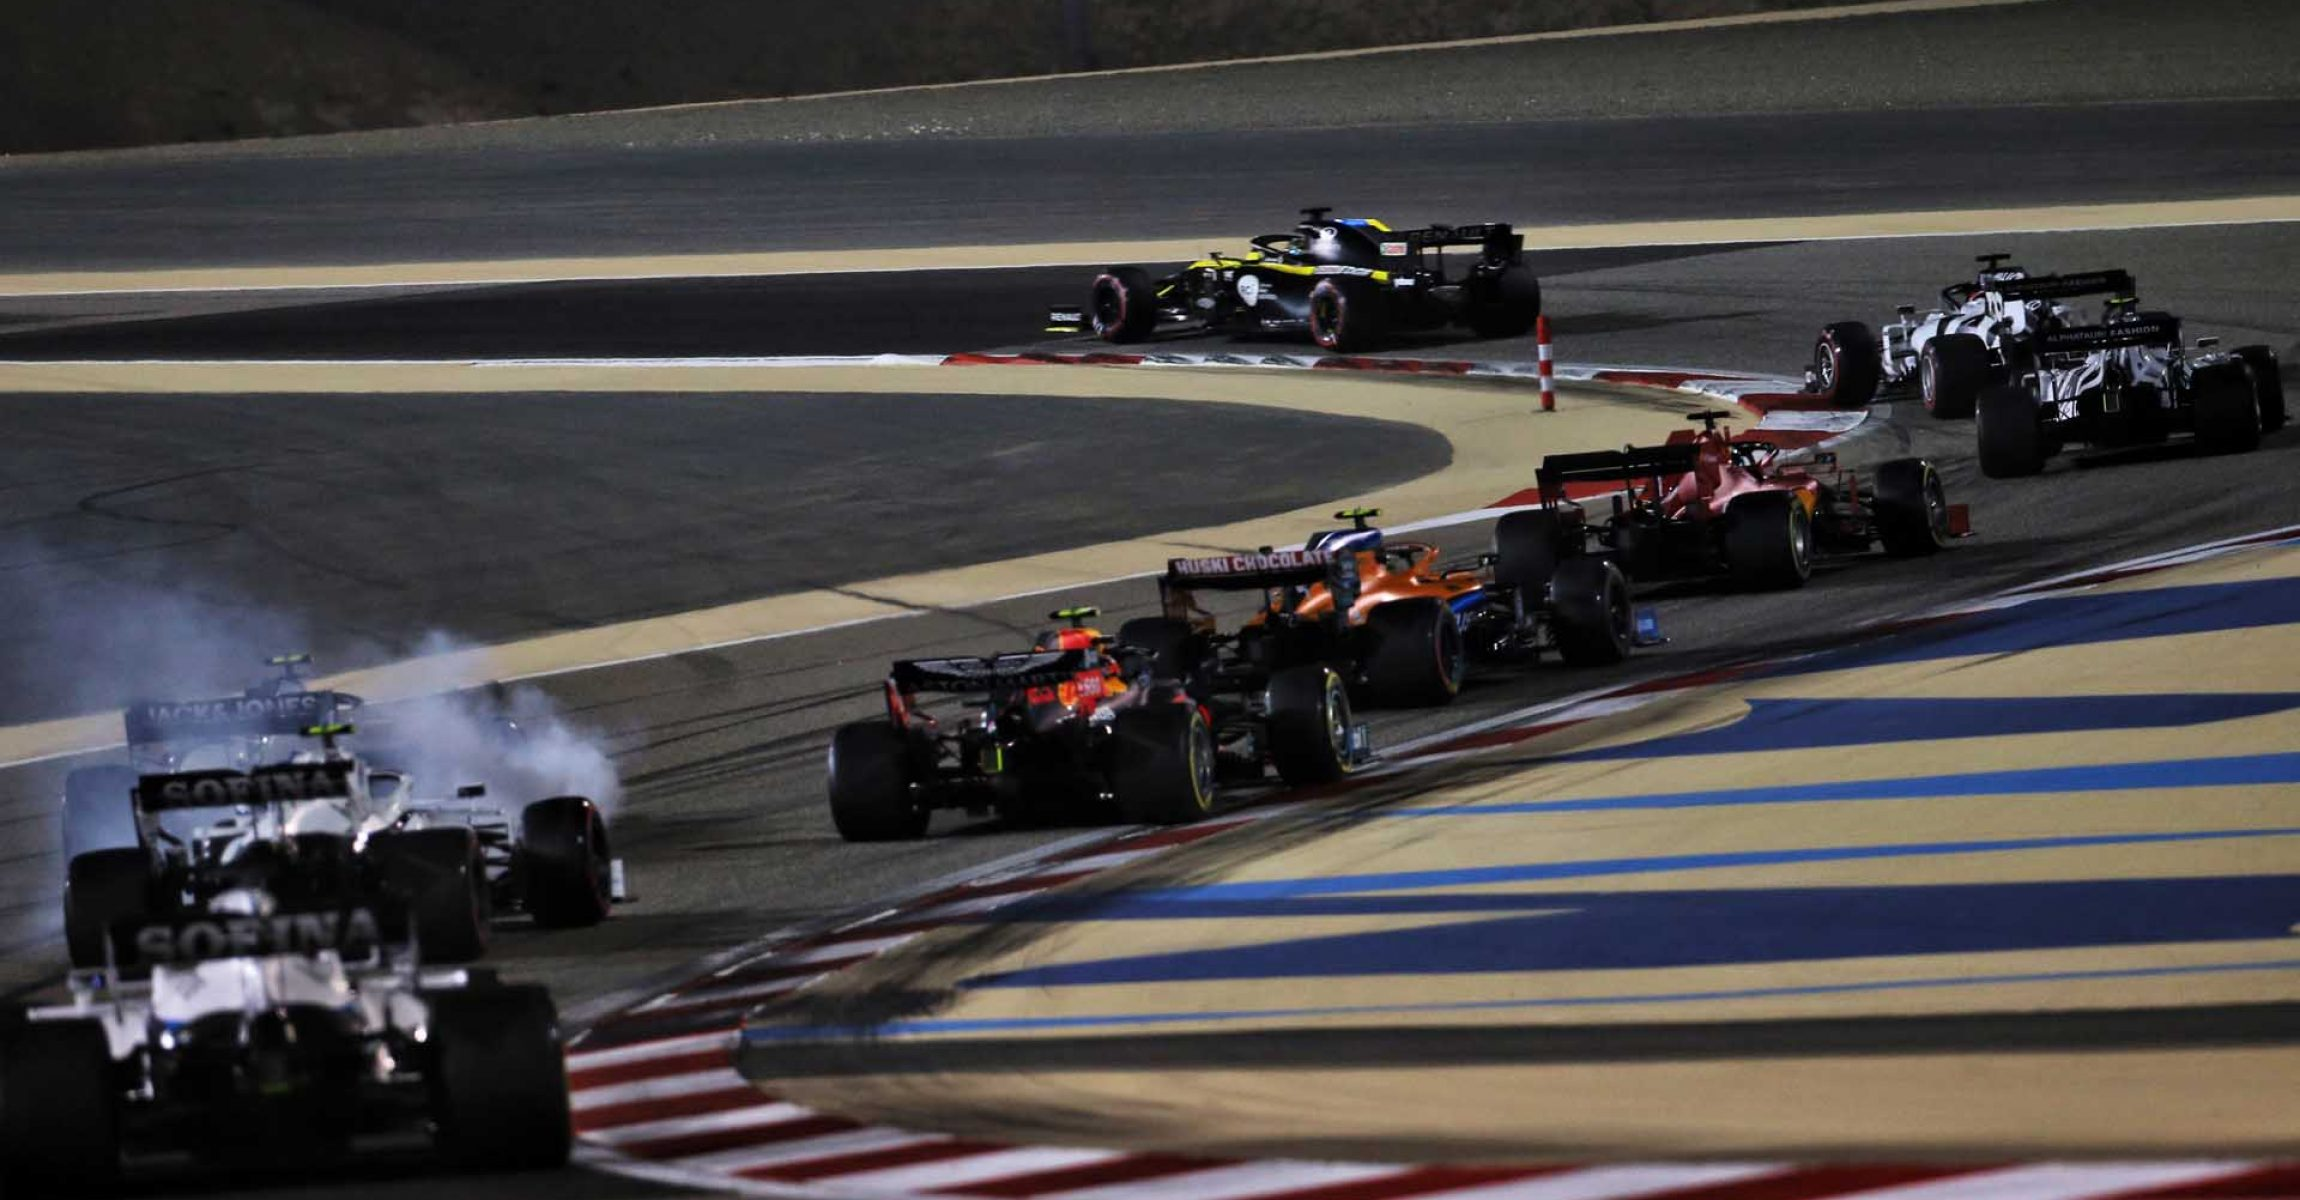 Daniel Ricciardo (AUS) Renault F1 Team RS20 at the start of the race. Sakhir Grand Prix, Sunday 6th December 2020. Sakhir, Bahrain.